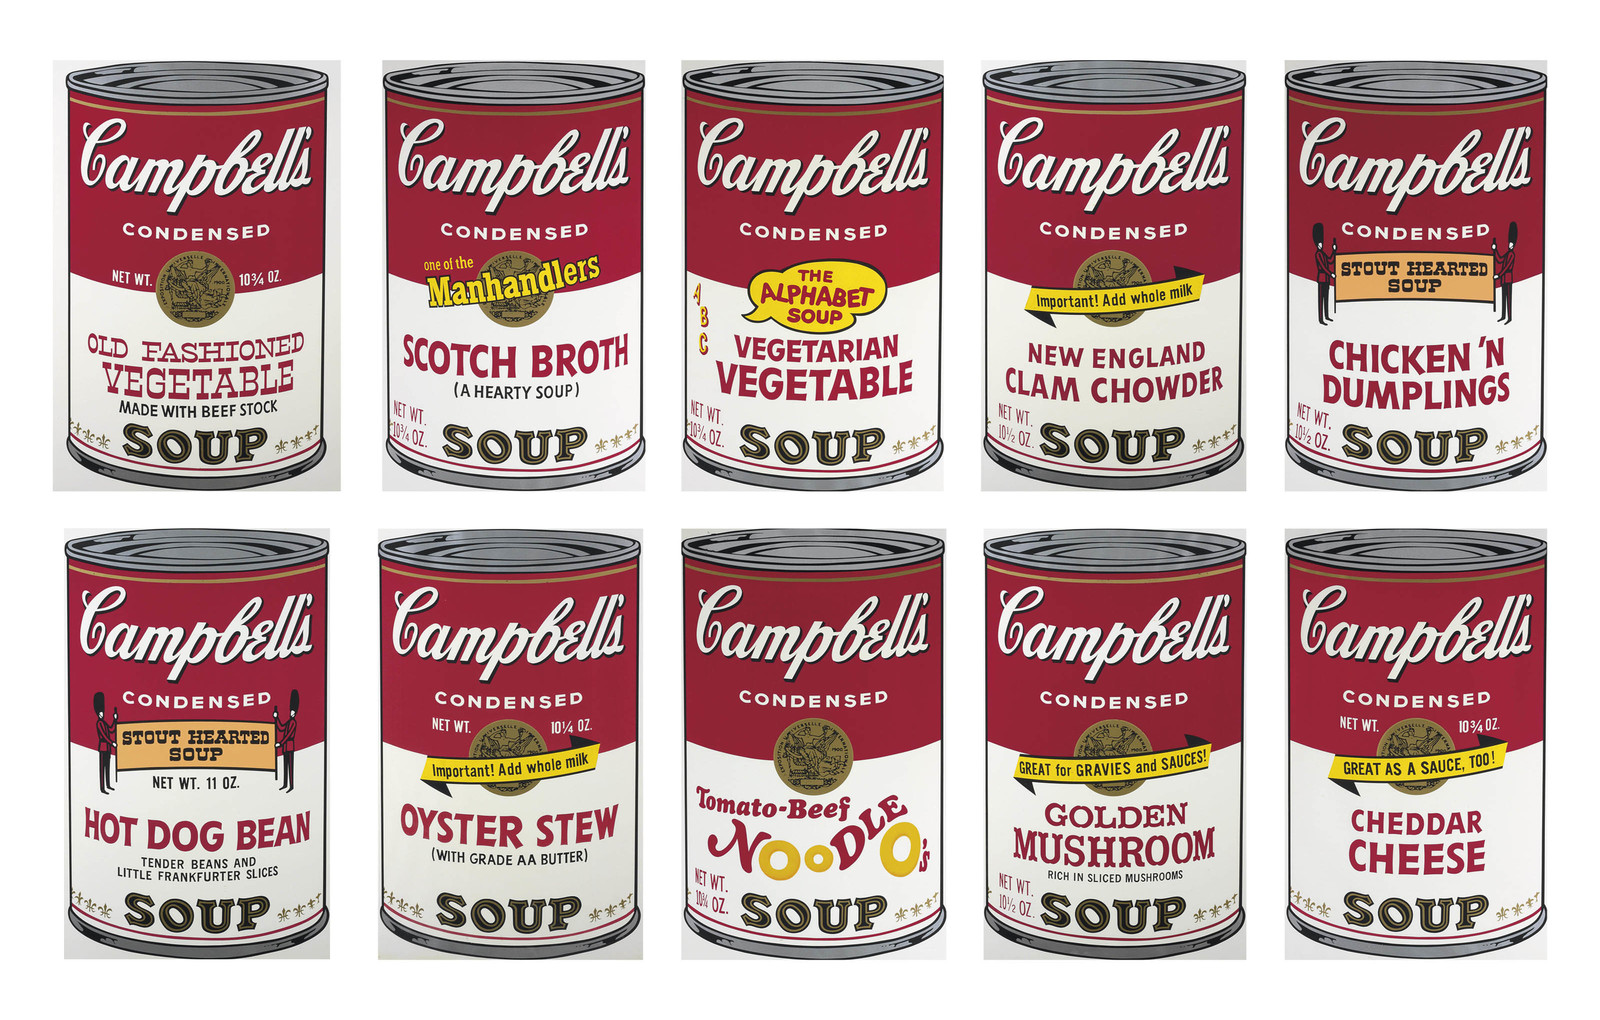 2012_CKS_05088_0151_000(andy_warhol_campbells_soup_ii)